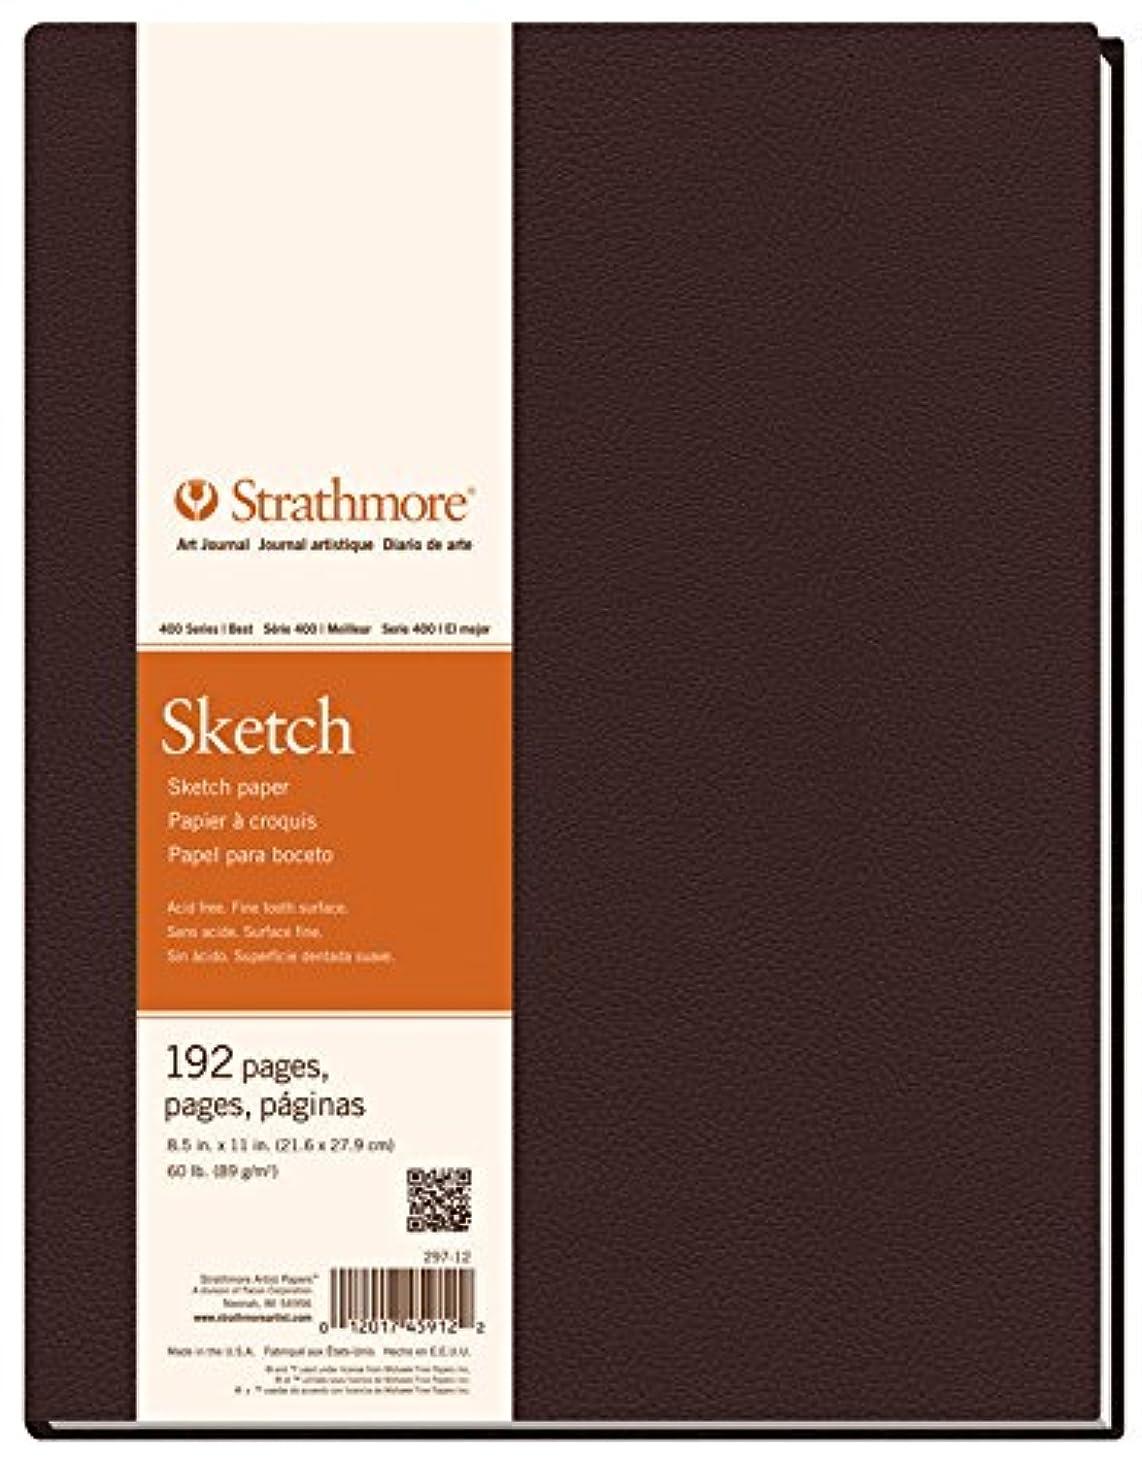 Strathmore Sketchbook 400 Series Hardbound Art Journal Sketch, 5.5